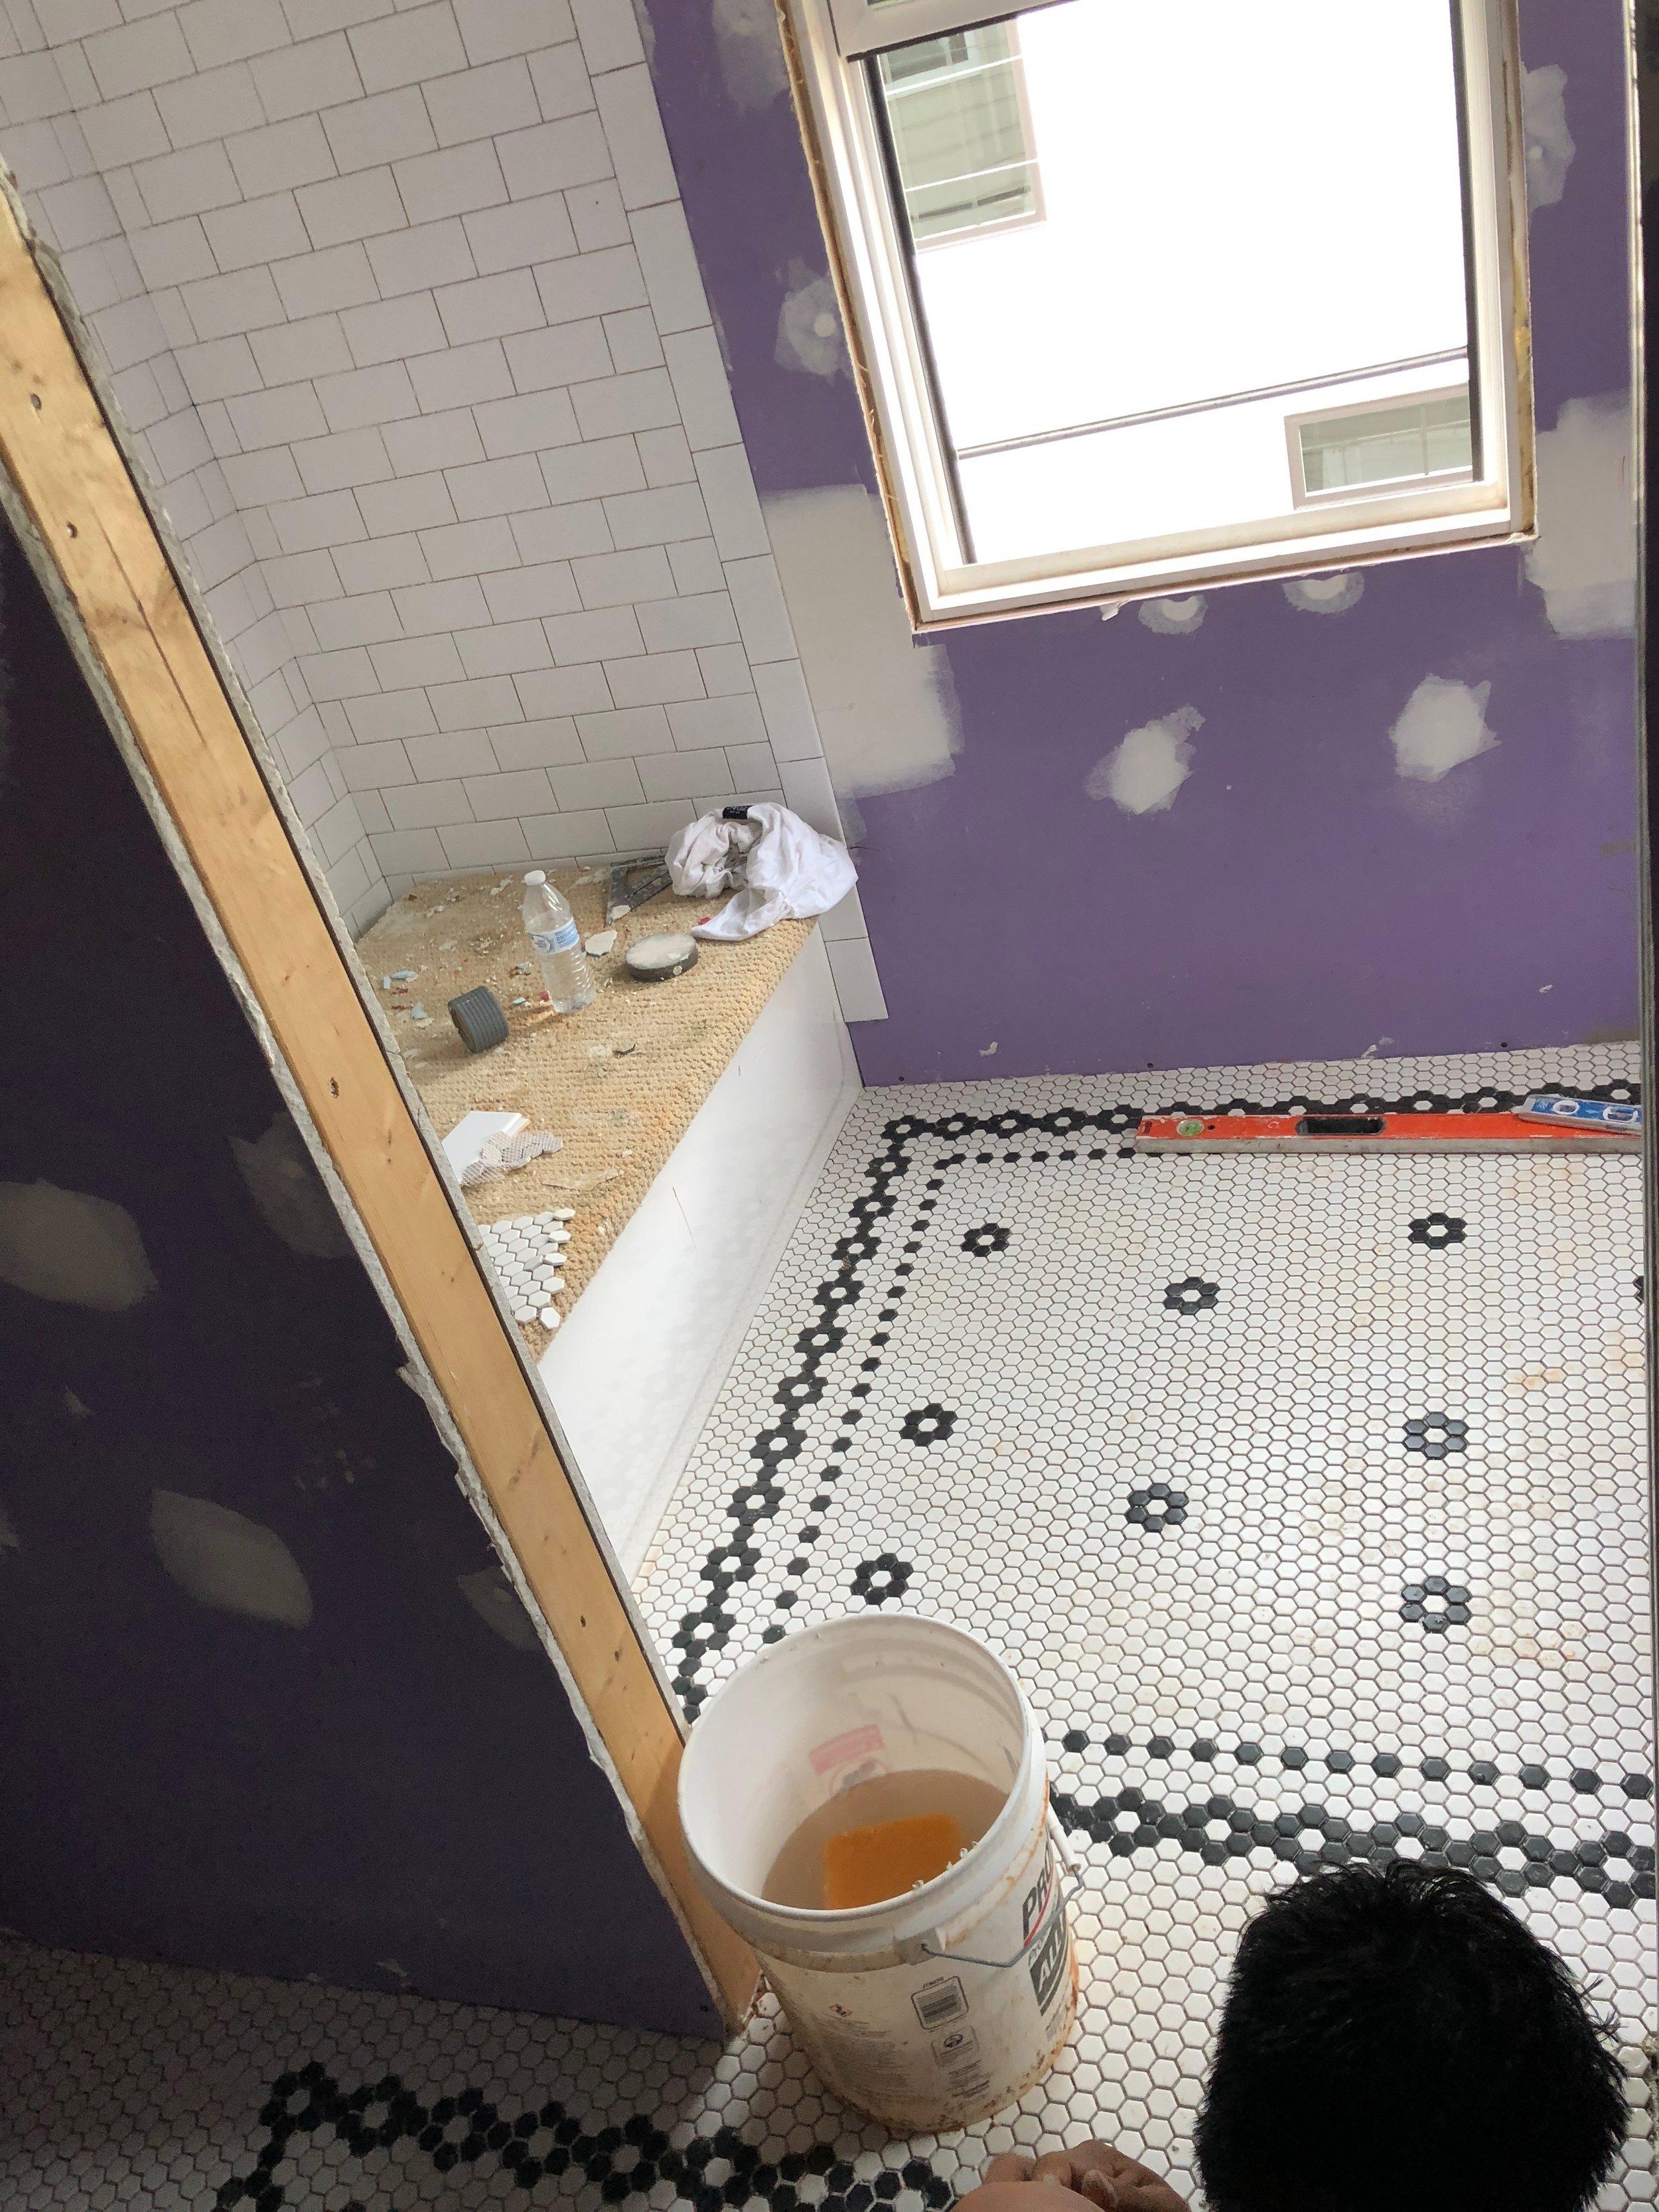 Hex Tile Mosaic Bathroom Floor- Interior Design by Laura Design Co.